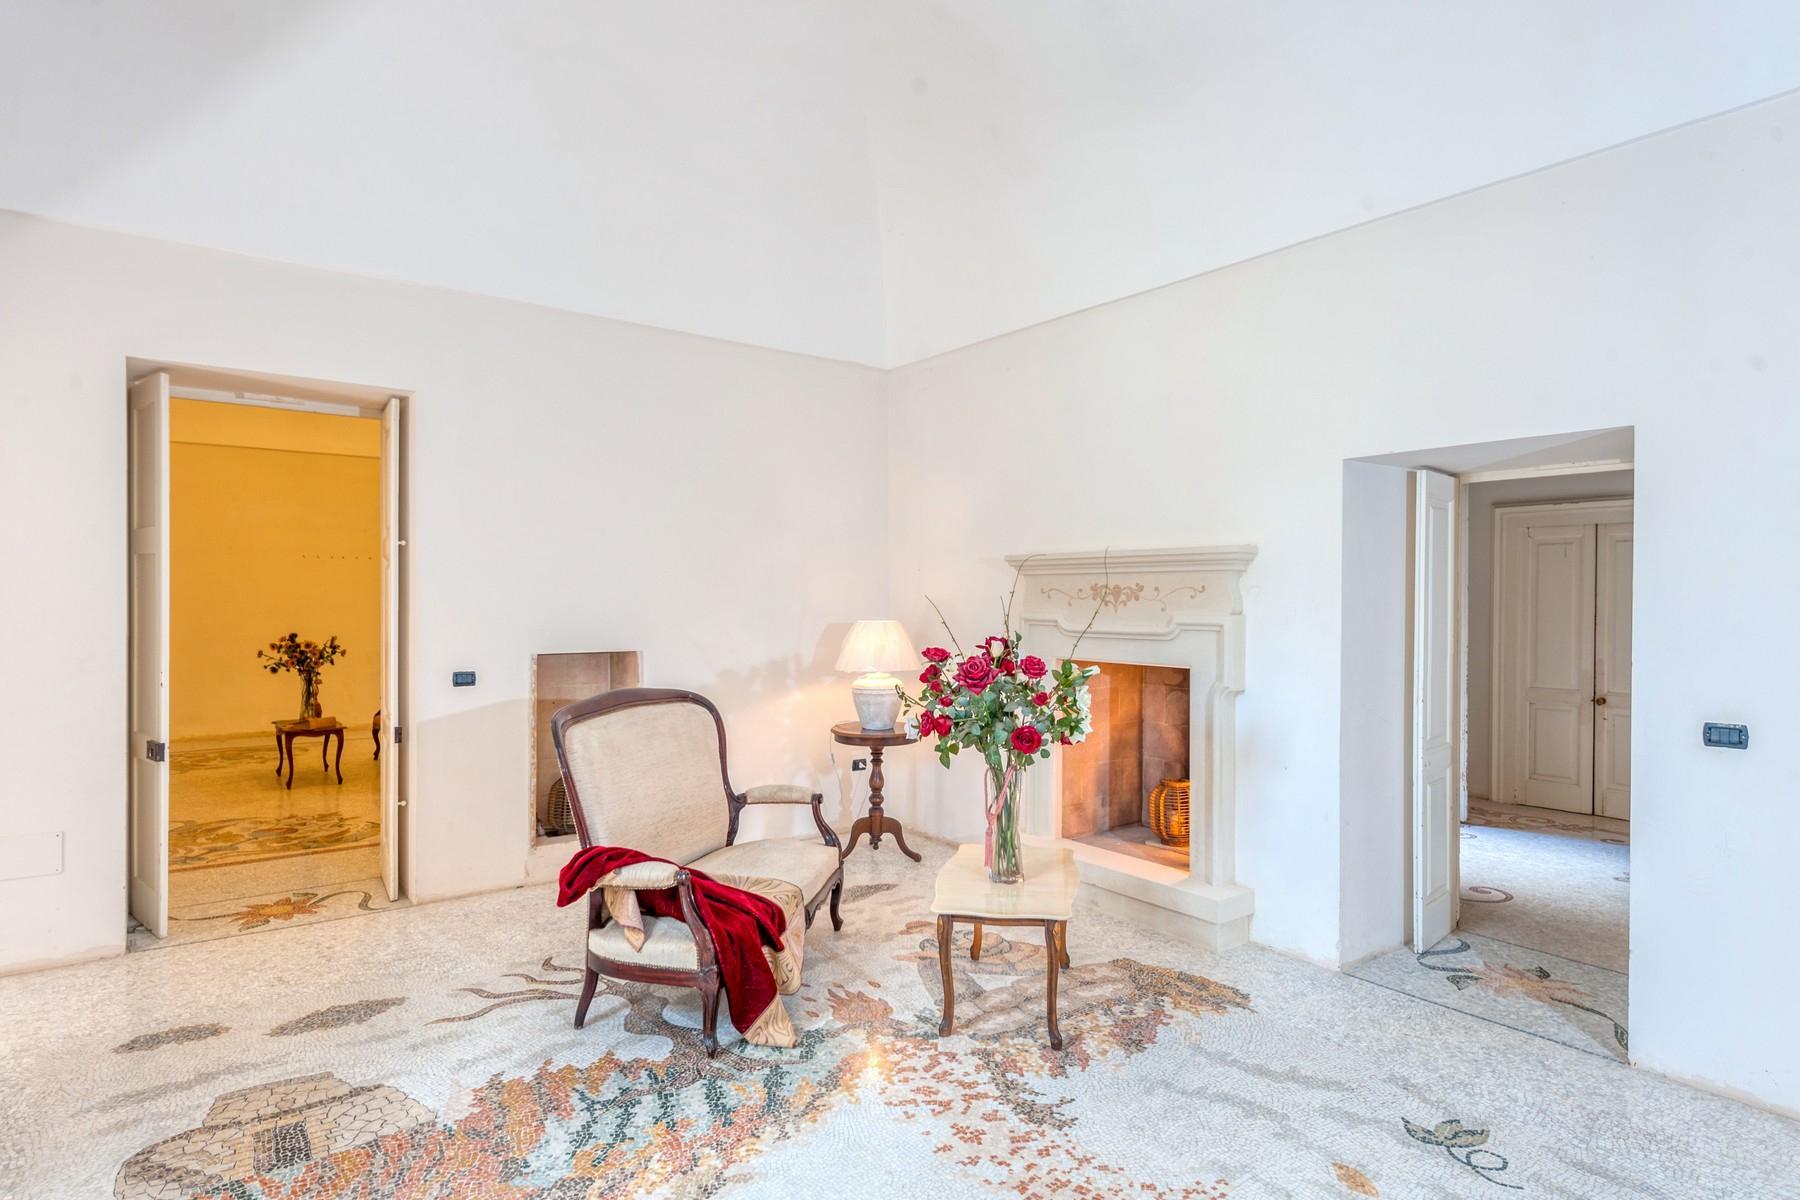 Palazzo Micali, маленькая жемчужина в Саленто - 5